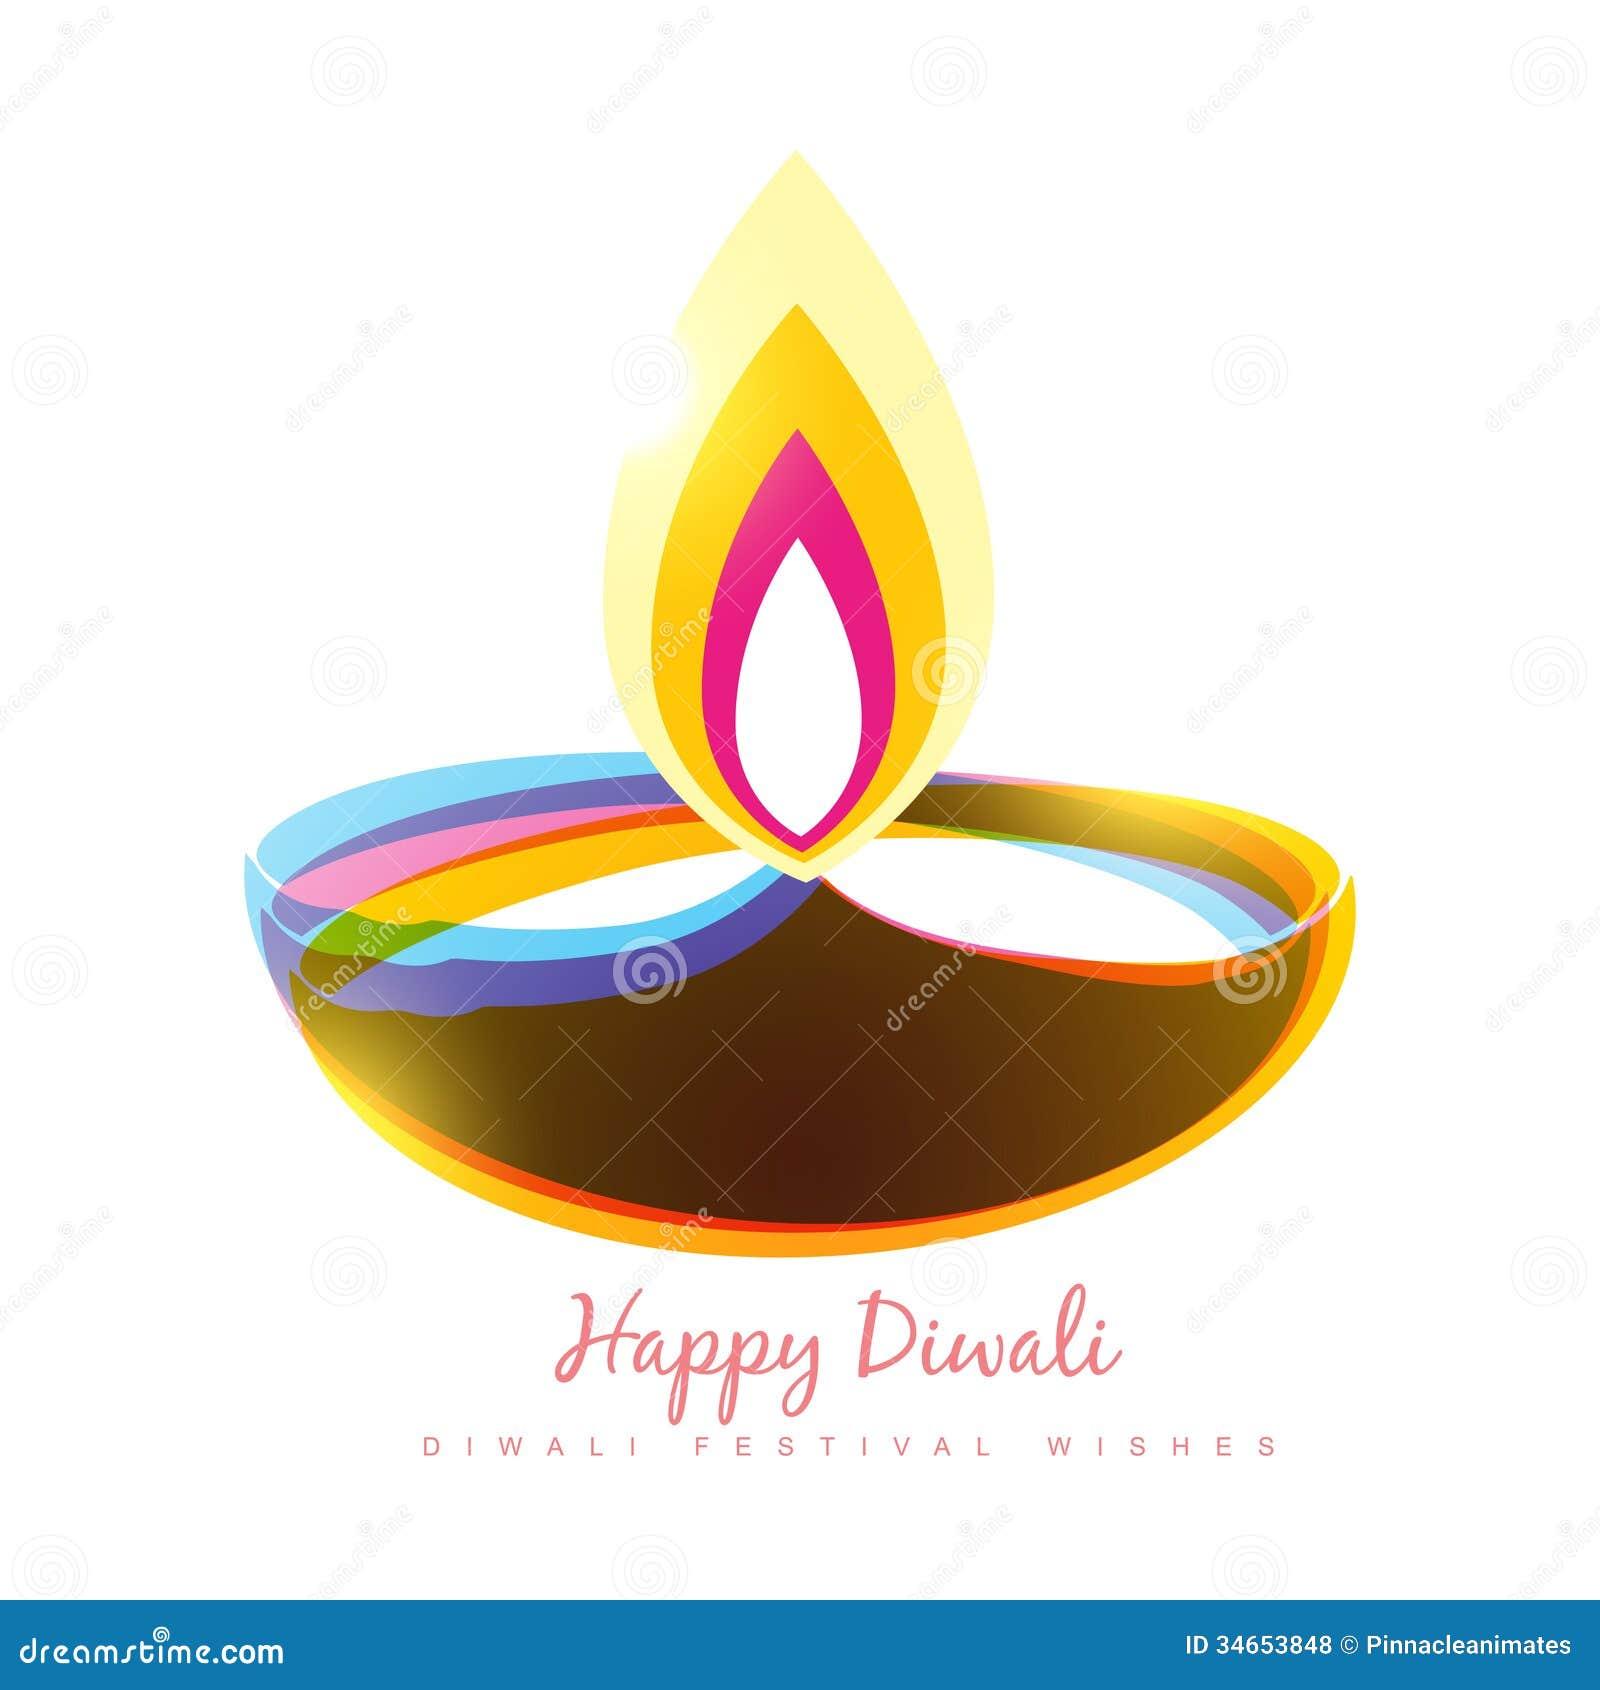 Diwali Festival Royalty Free Stock Photos - Image: 34653848